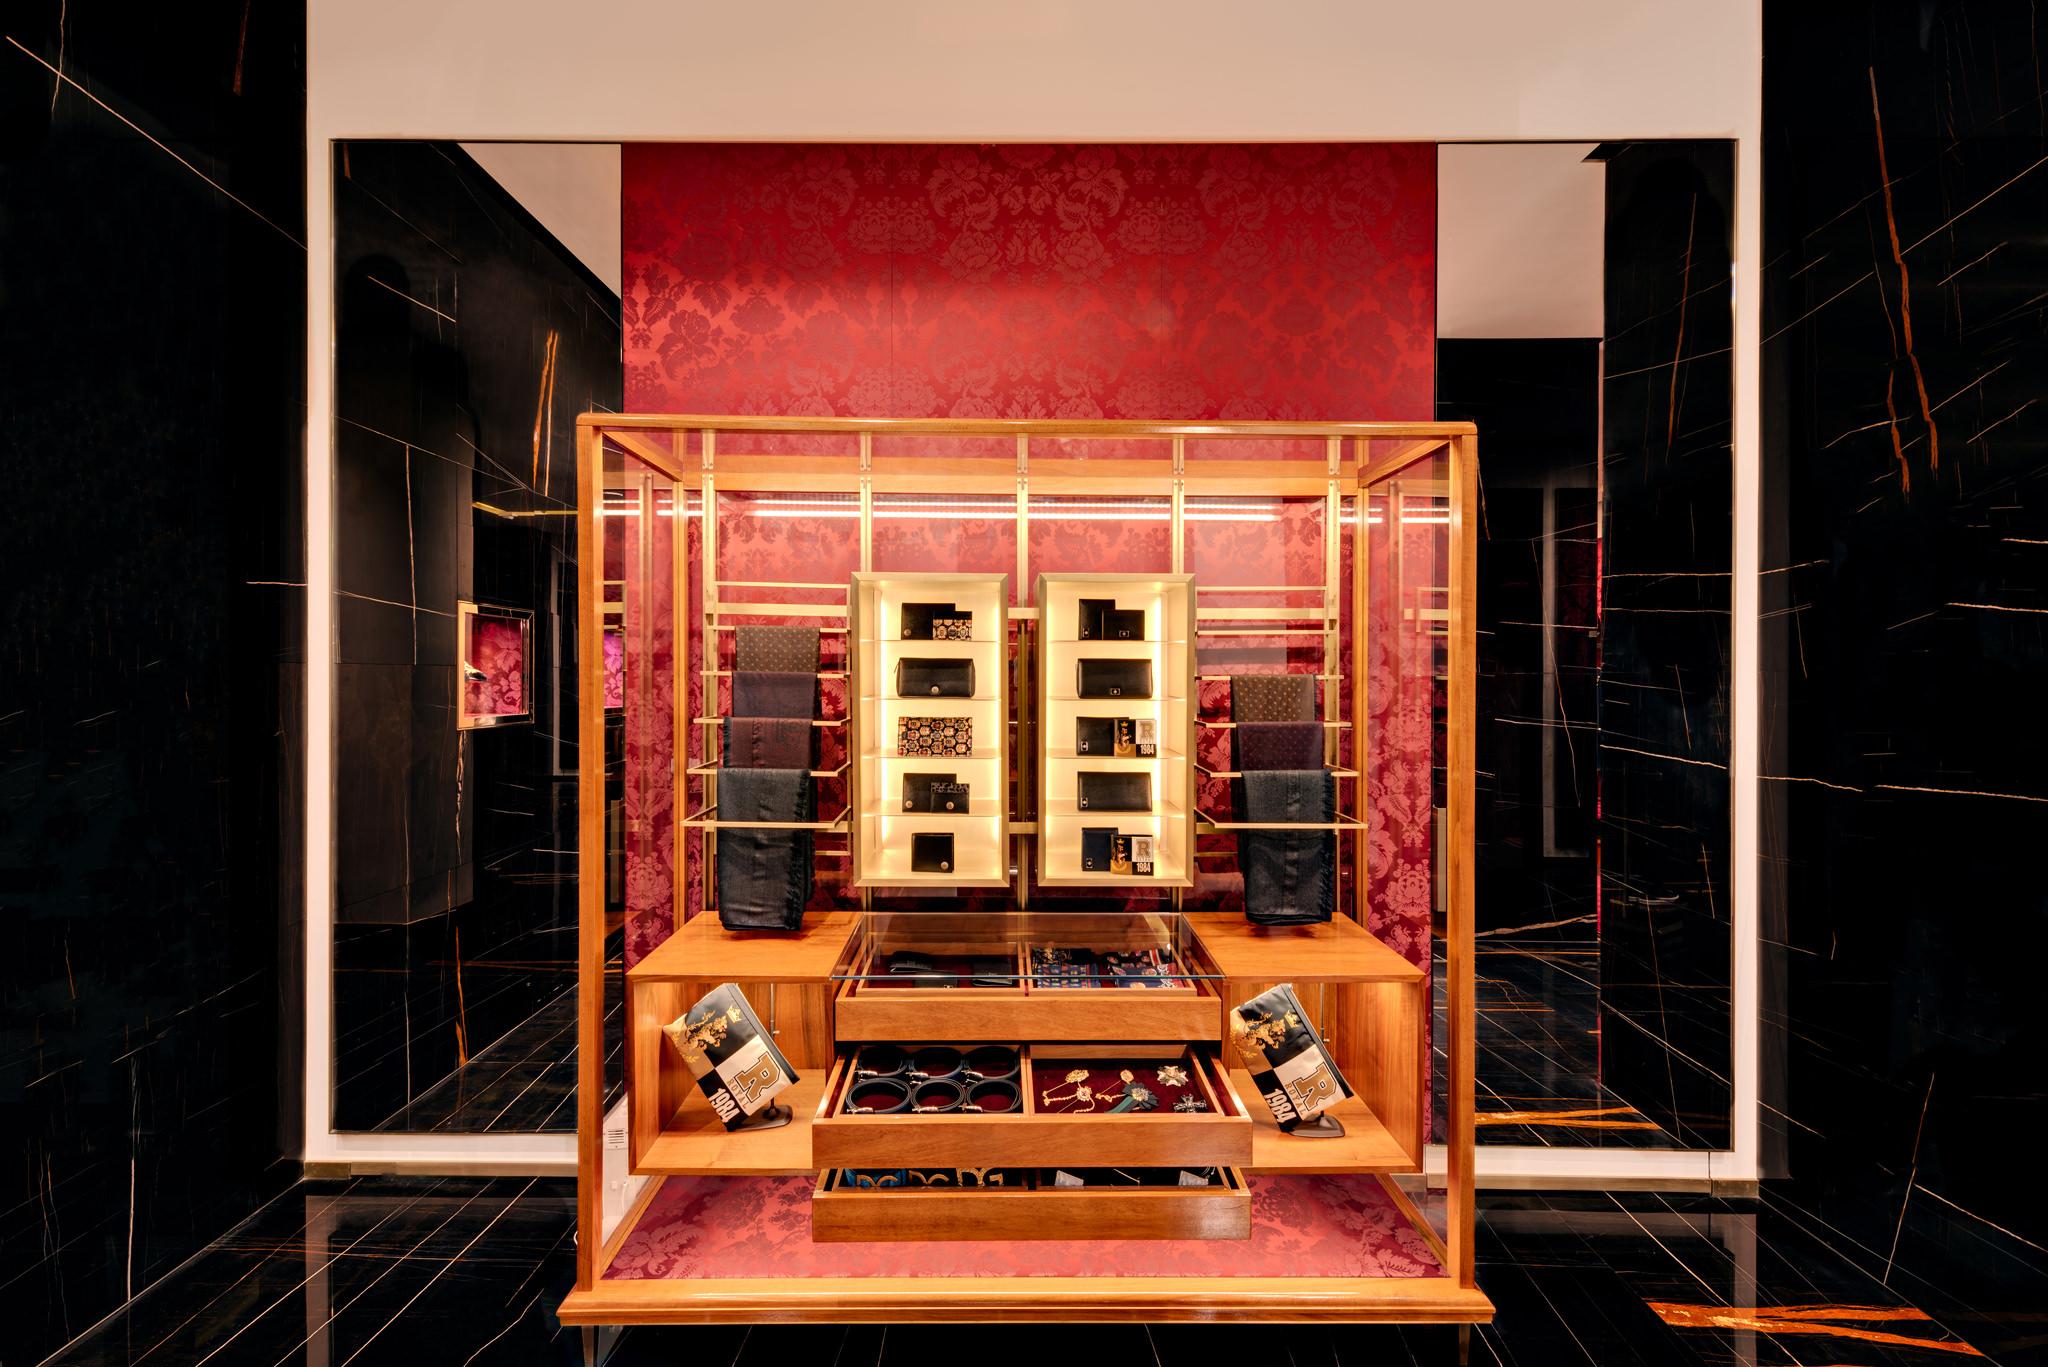 20171011 - Dolce & Gabbana - HCM - Commercial - Interior - Store - Retouch 0037.jpg